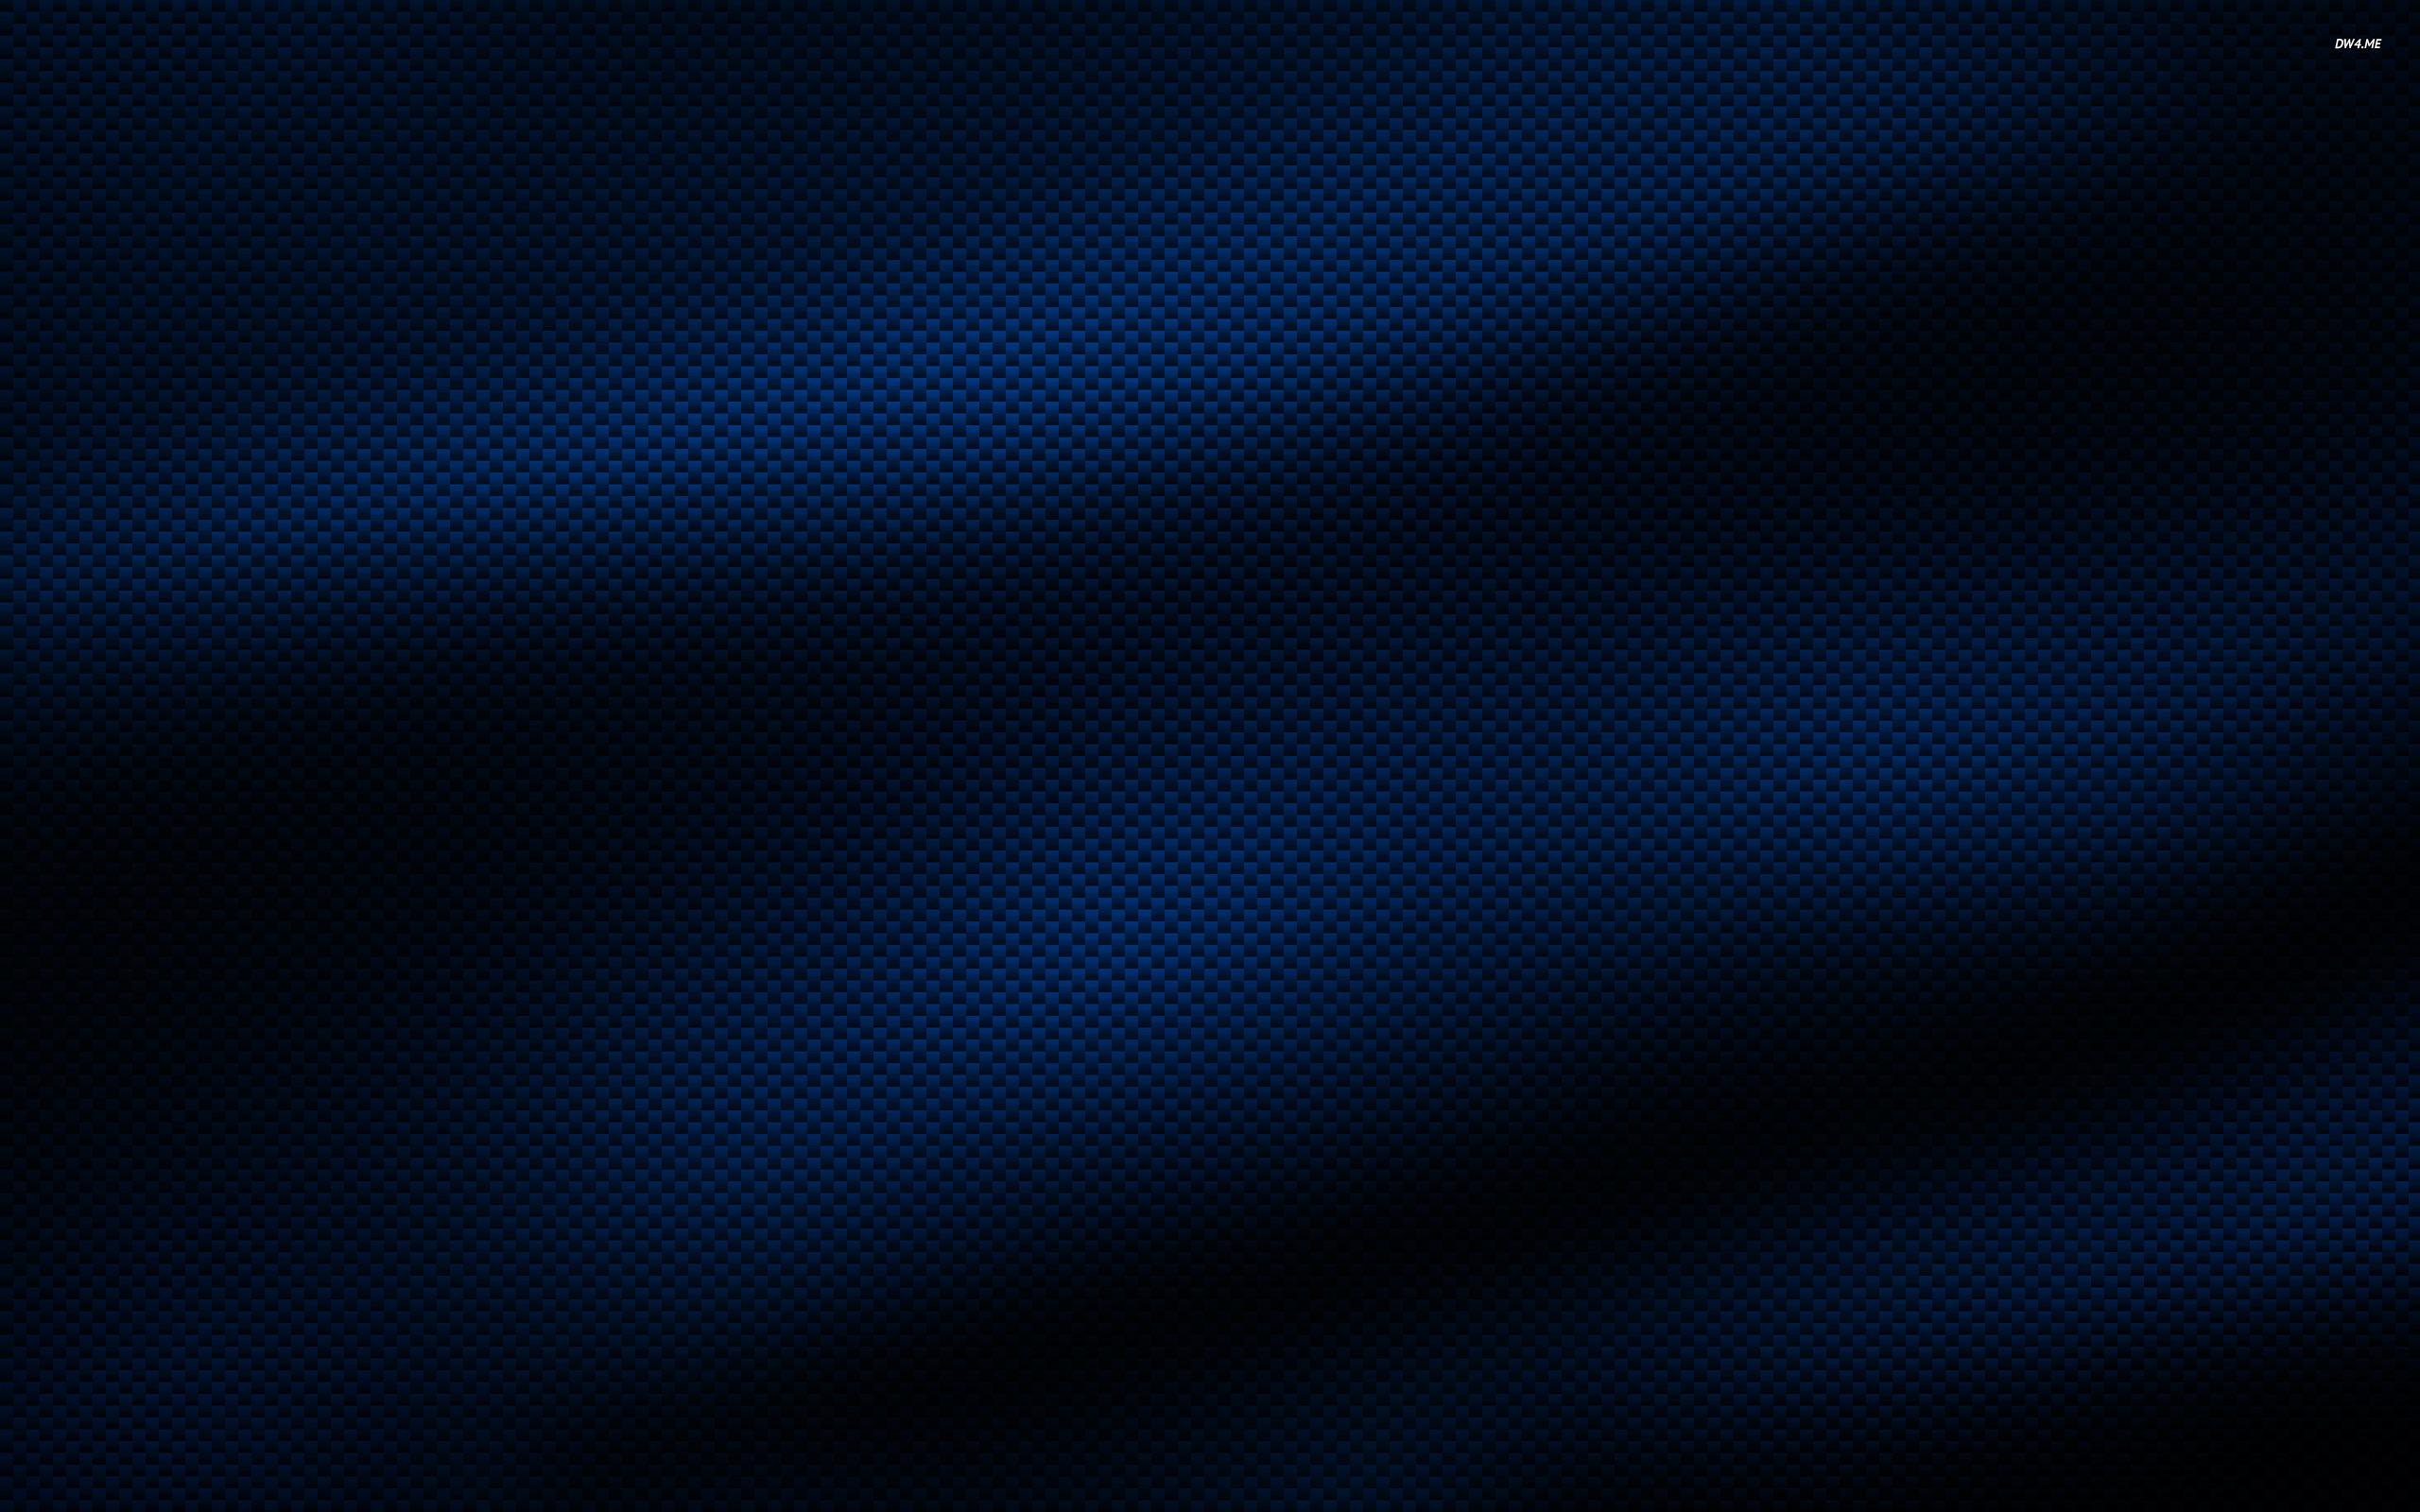 40+ HD Carbon Fiber Wallpaper on WallpaperSafari